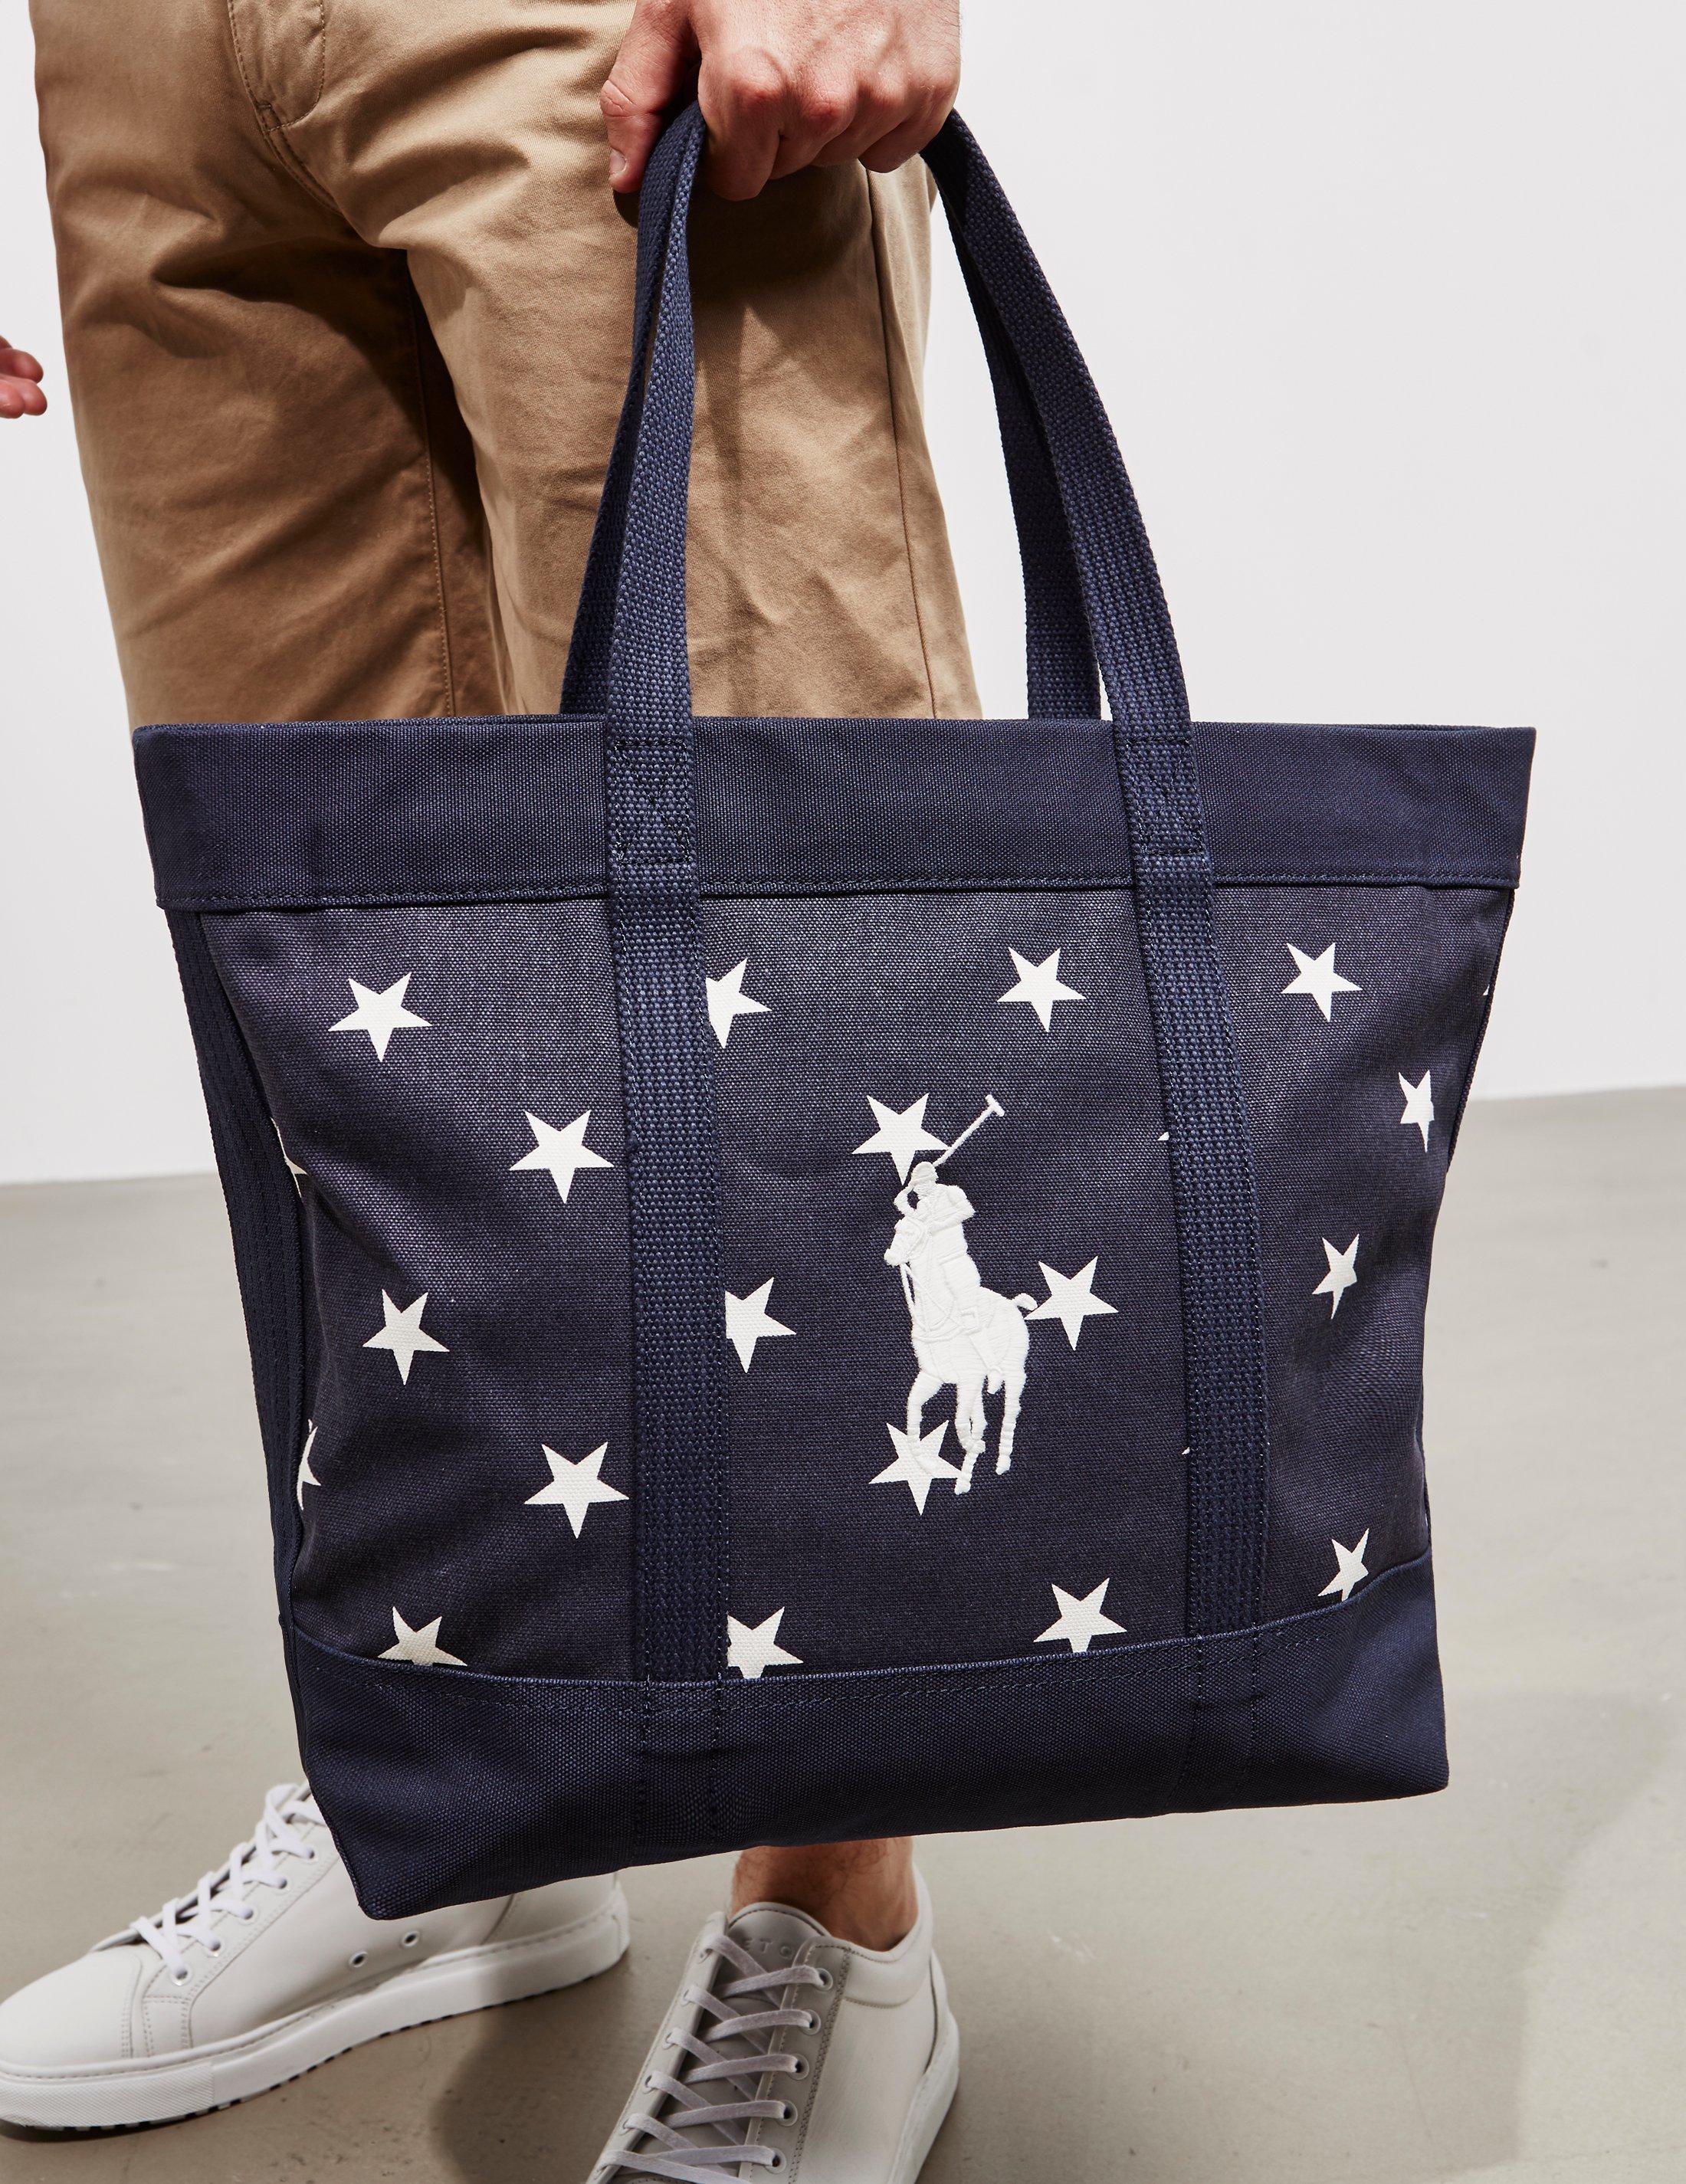 abf91de30df4 Polo Ralph Lauren Mens Stars Tote Bag - Online Exclusive Navy Blue ...